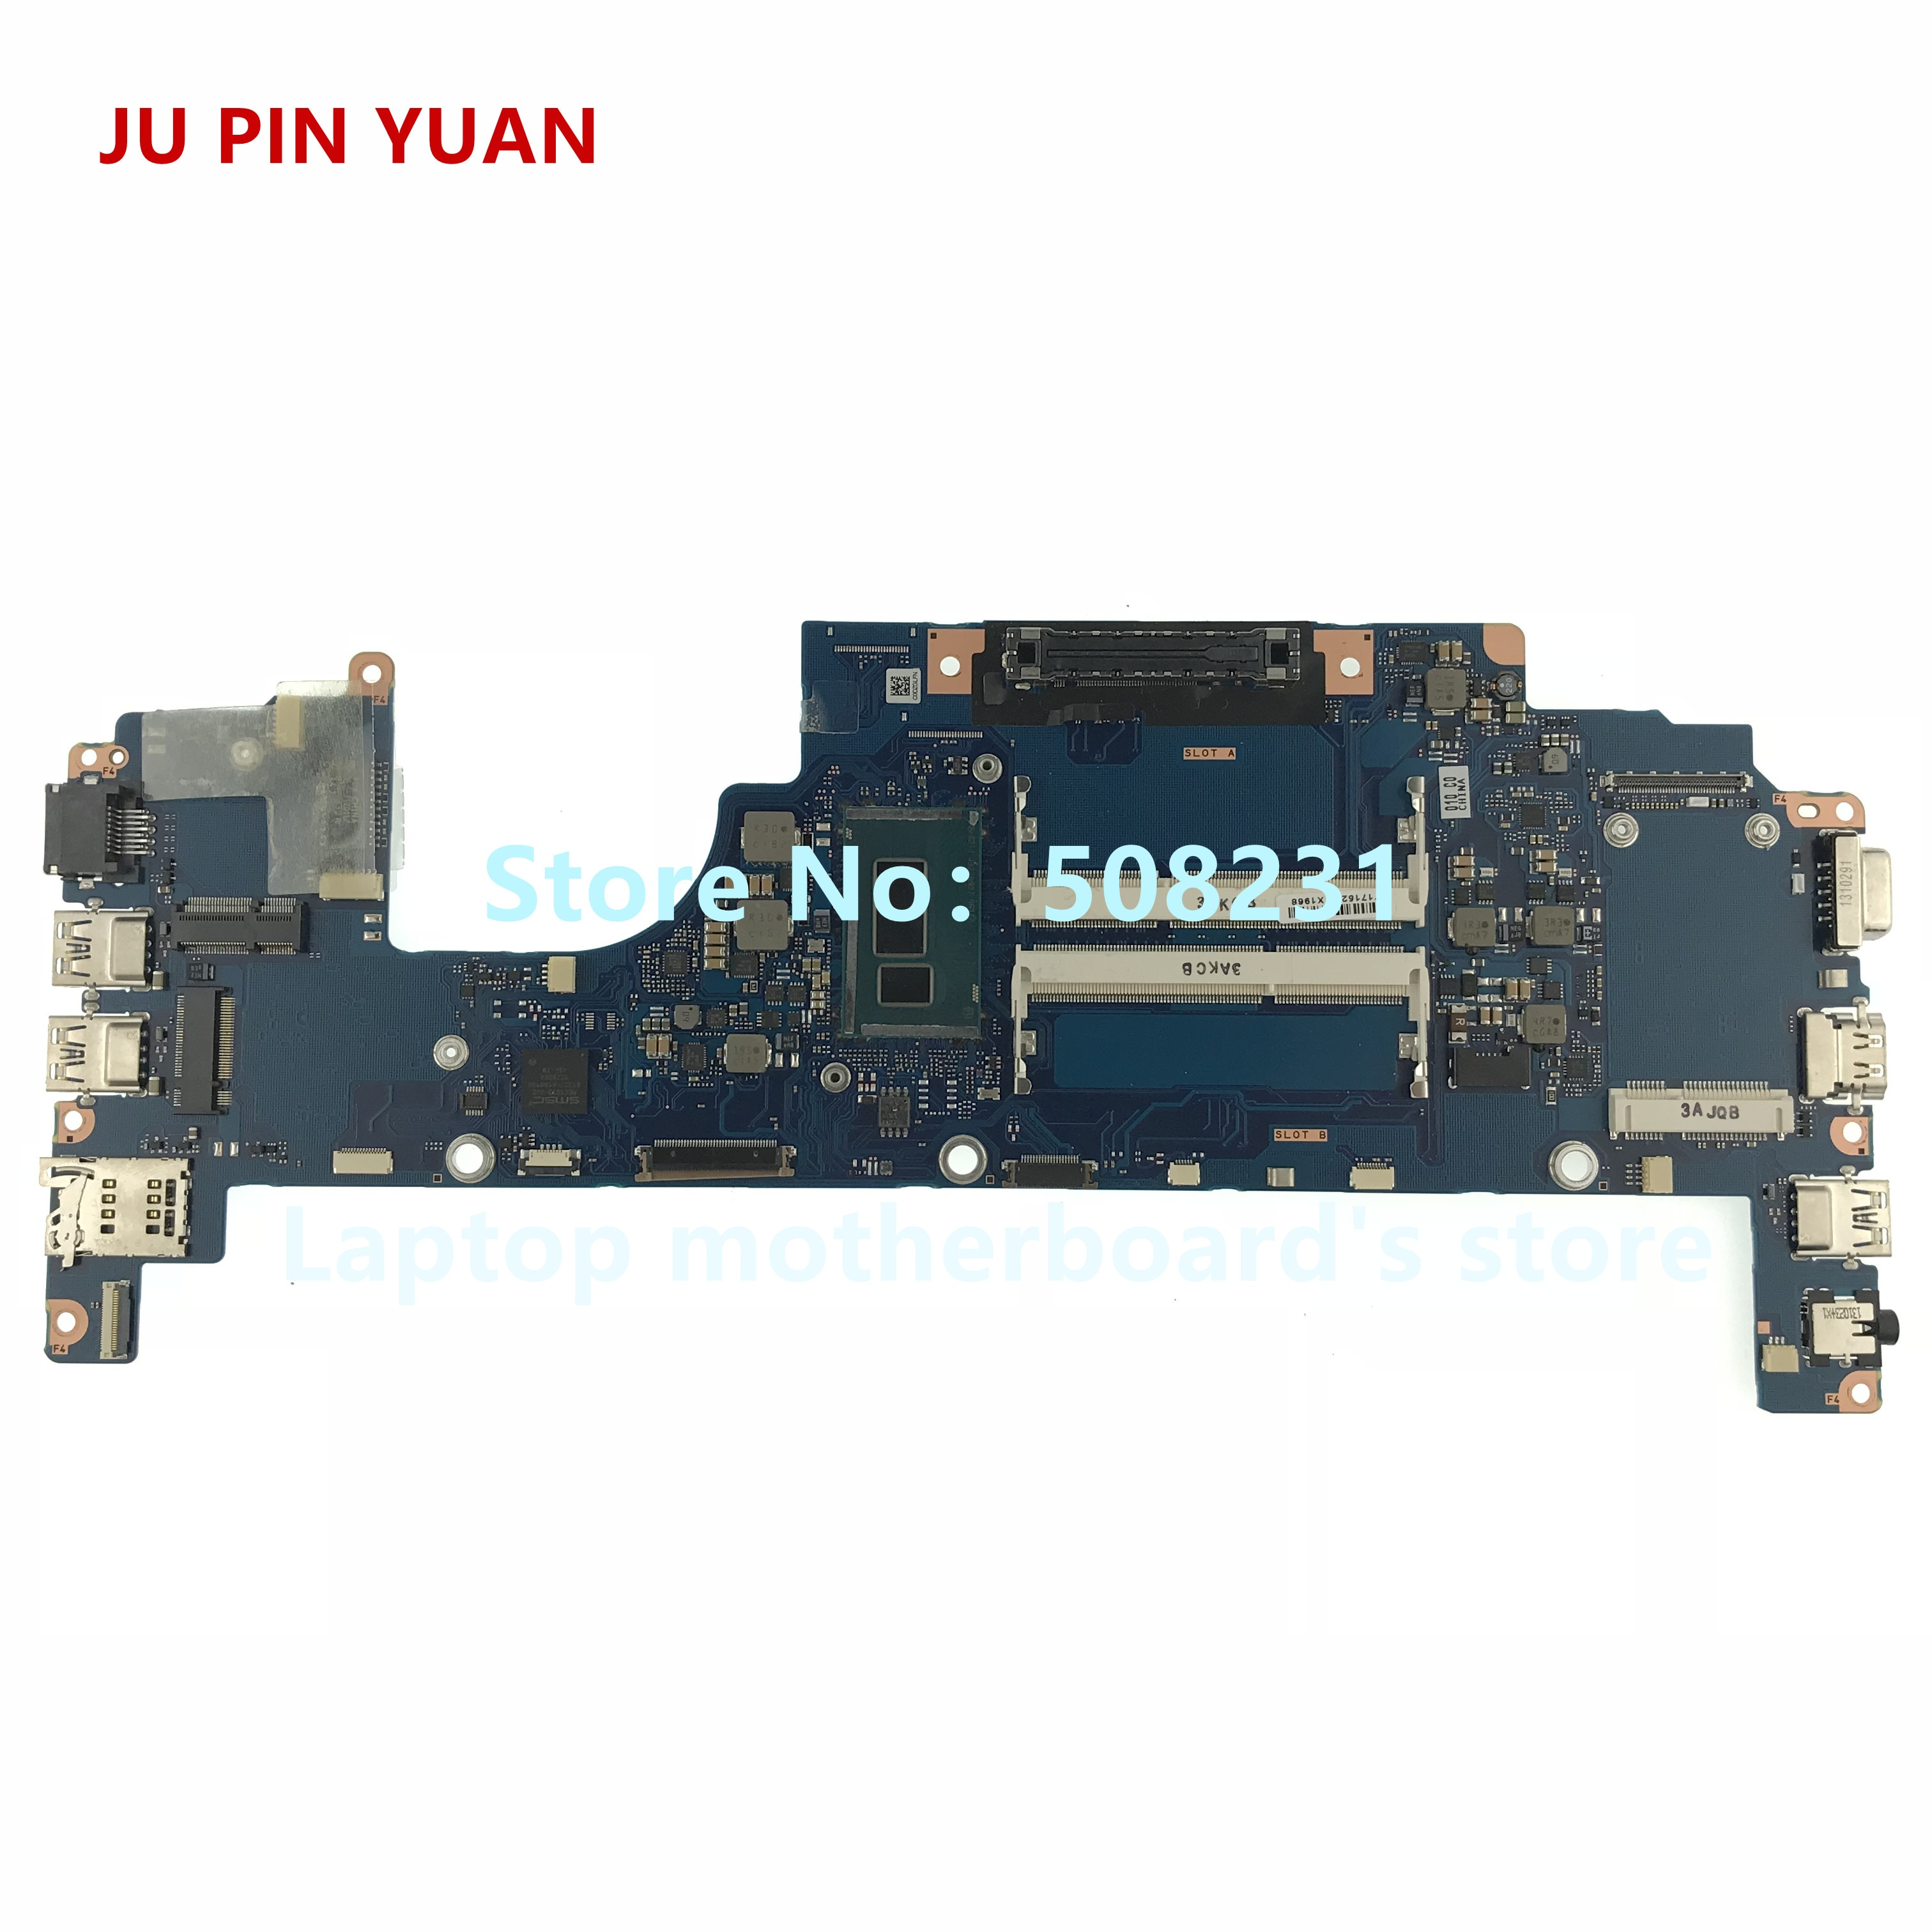 Placa base Ju pin yuan para Toshiba Portege Z30 Z30-A placa base para ordenador portátil fuxsy3 a366a con CPU de I7-4600U totalmente probada